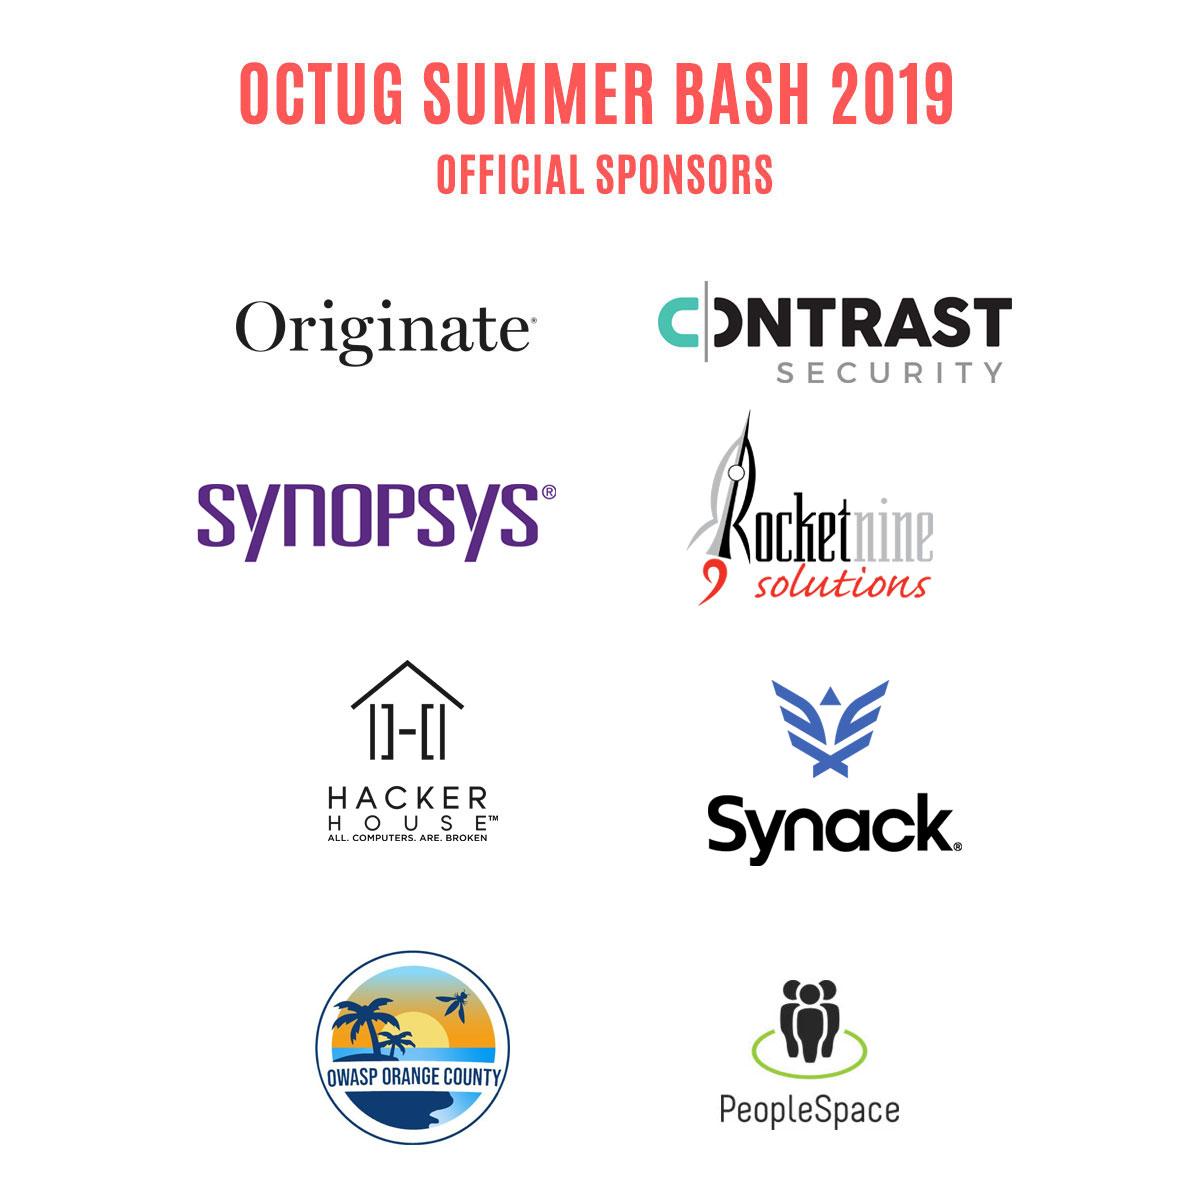 OCTUG_Summer-bash-sponsors-2019-june19-4